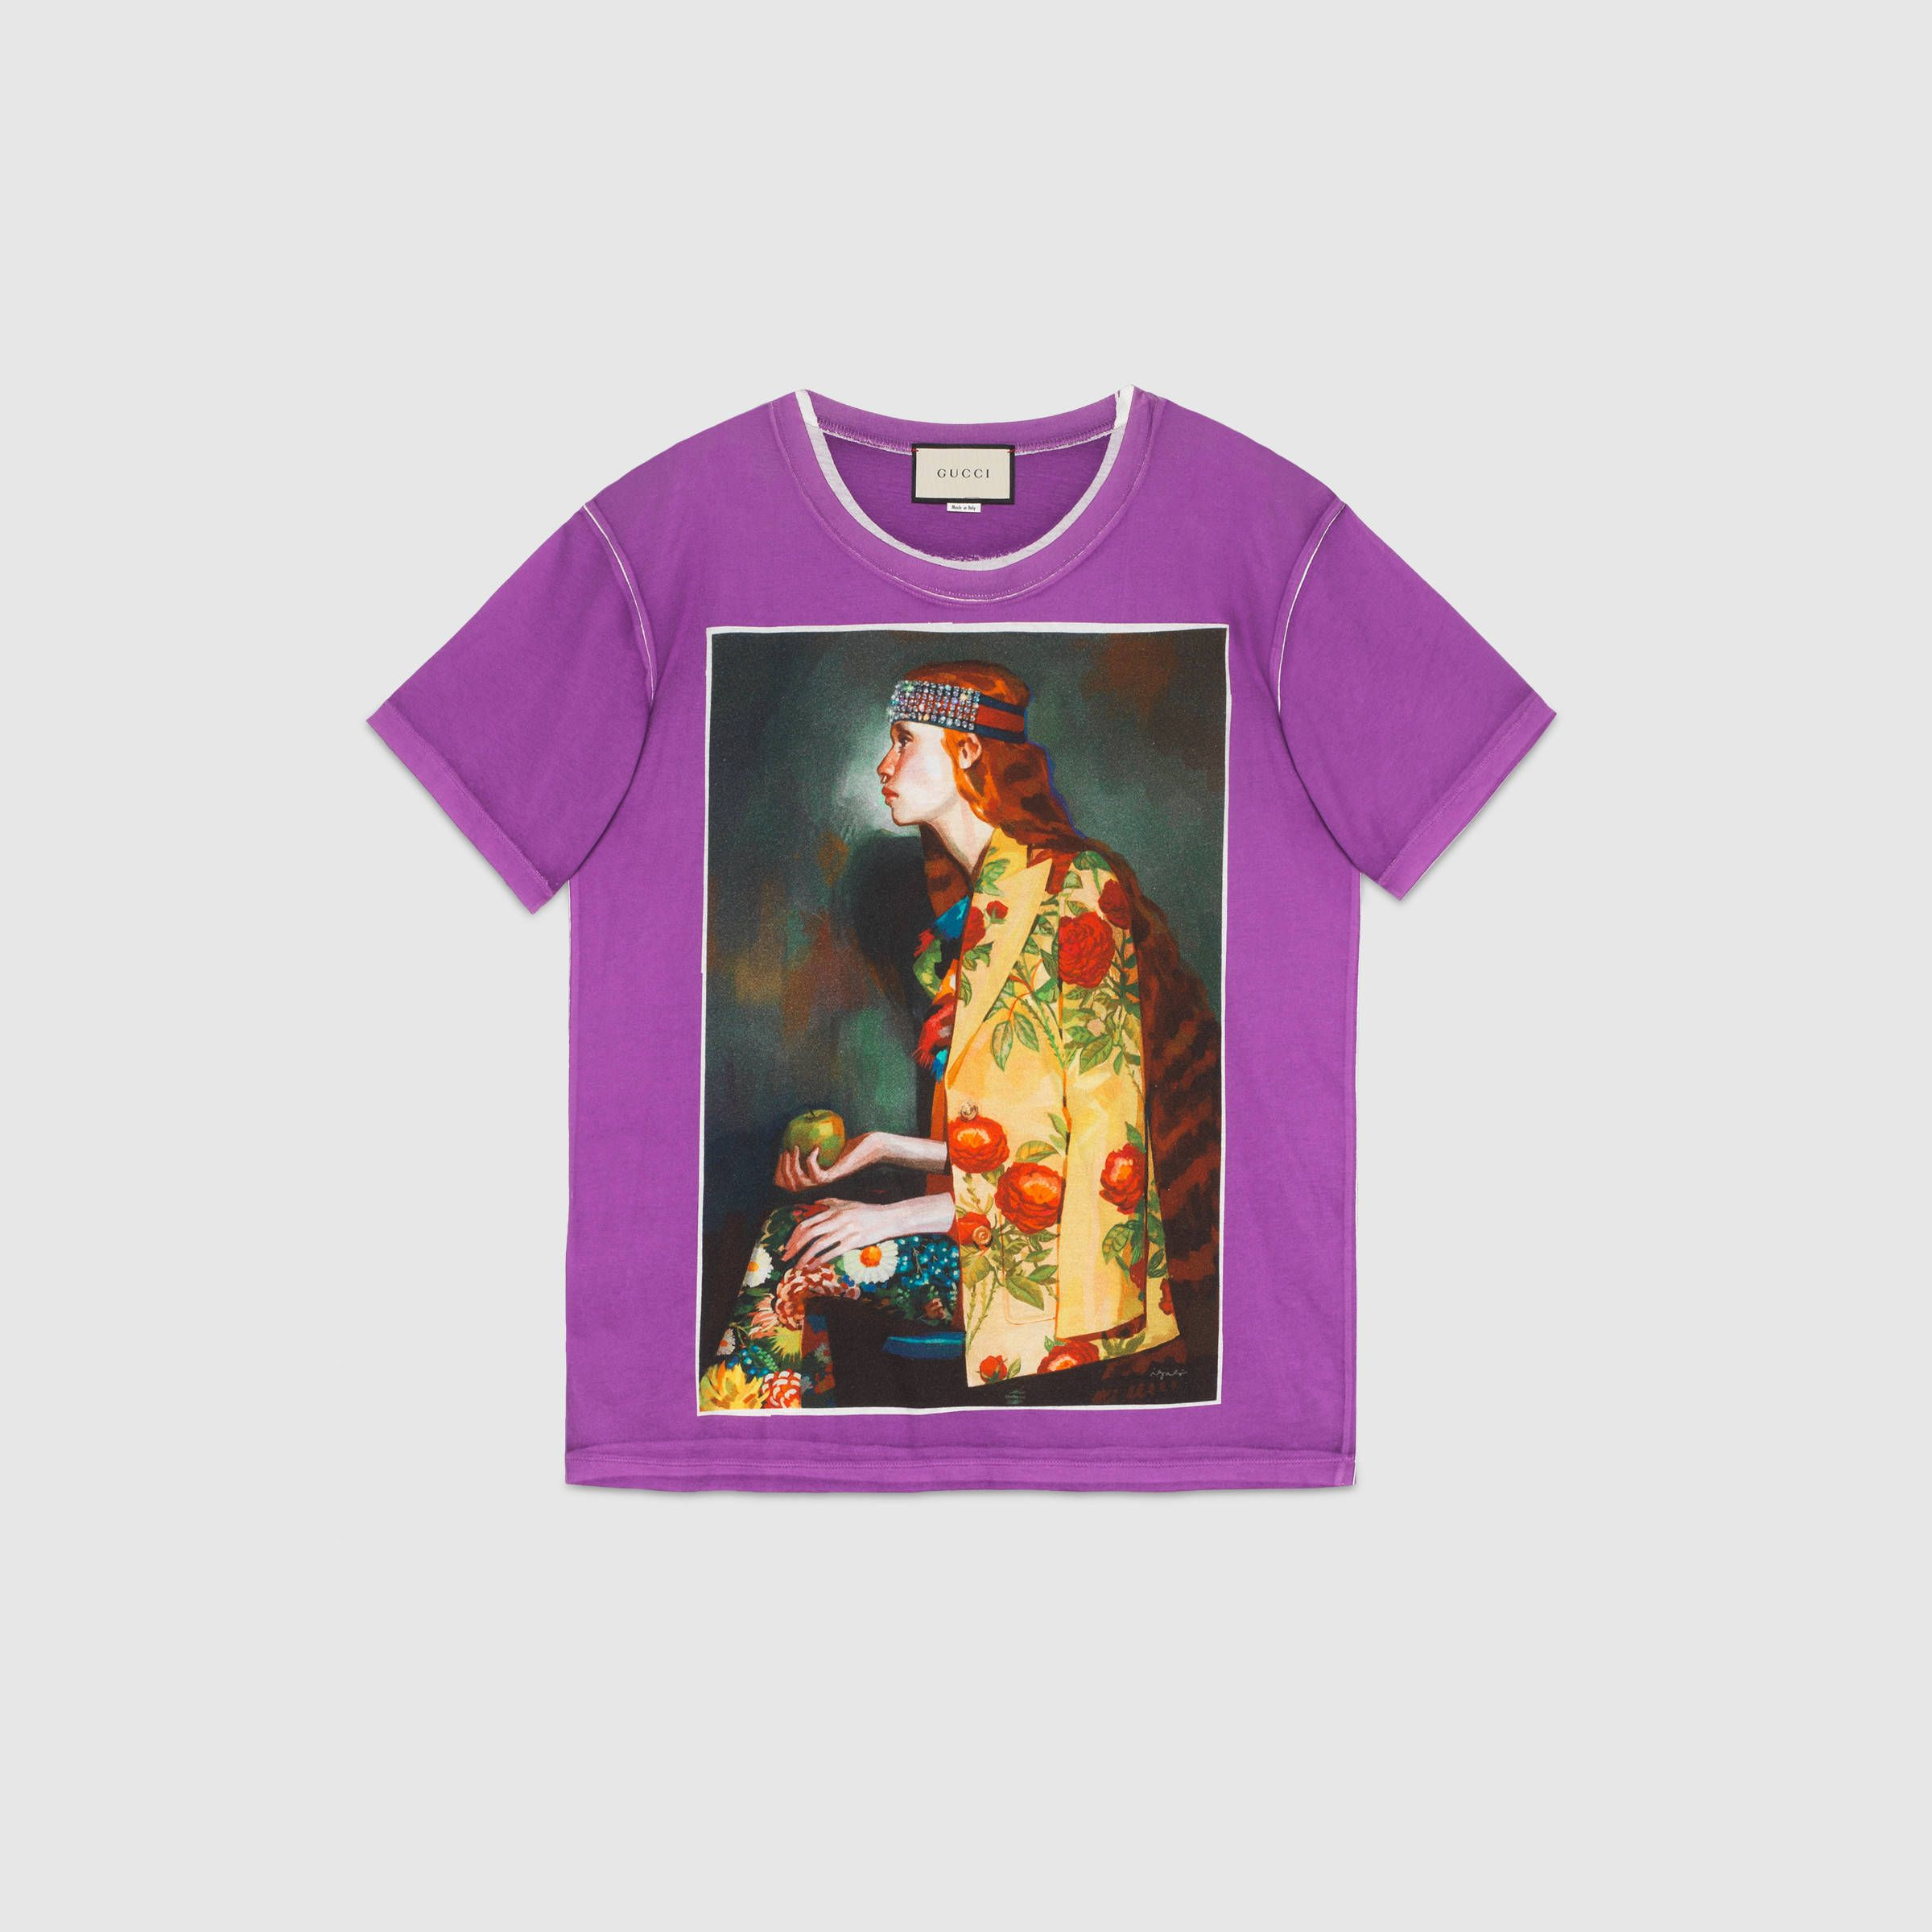 ad7aa2e13 Ignasi Monreal print T-shirt - Gucci Women's Ready to Wear 492347X3L905253